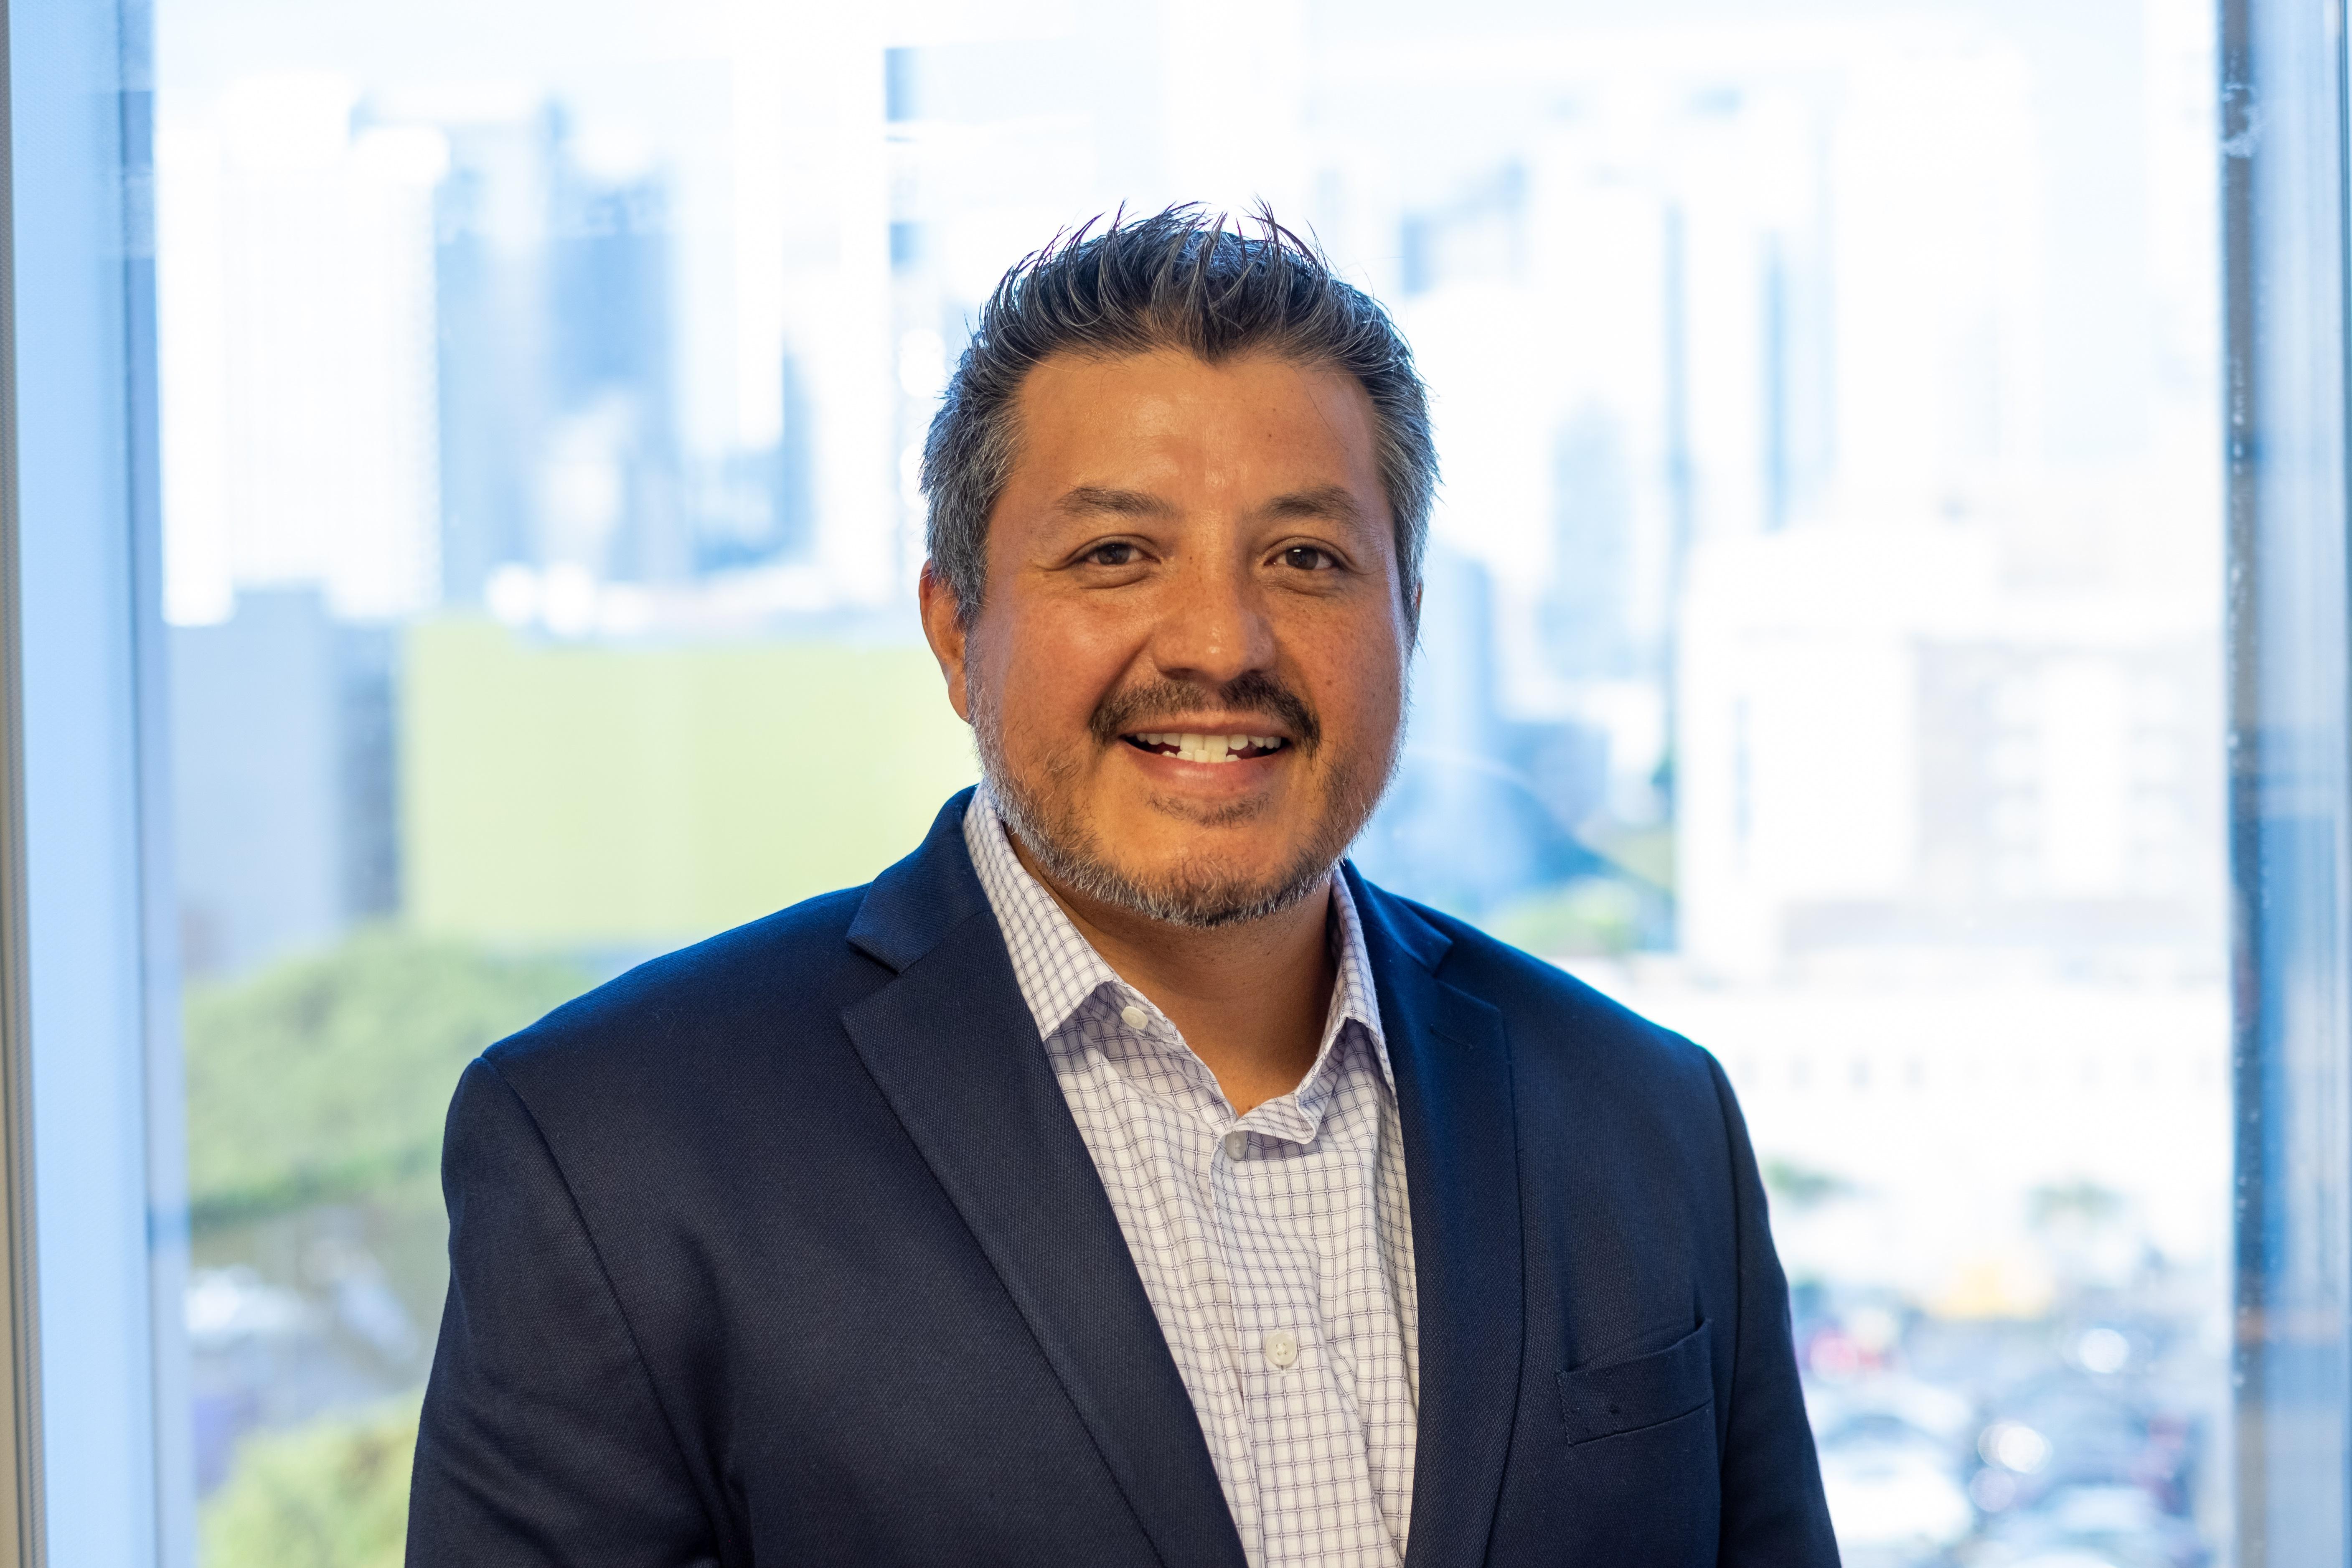 Oscar Cruz Headshot - Chief Operating Officer UWGLA